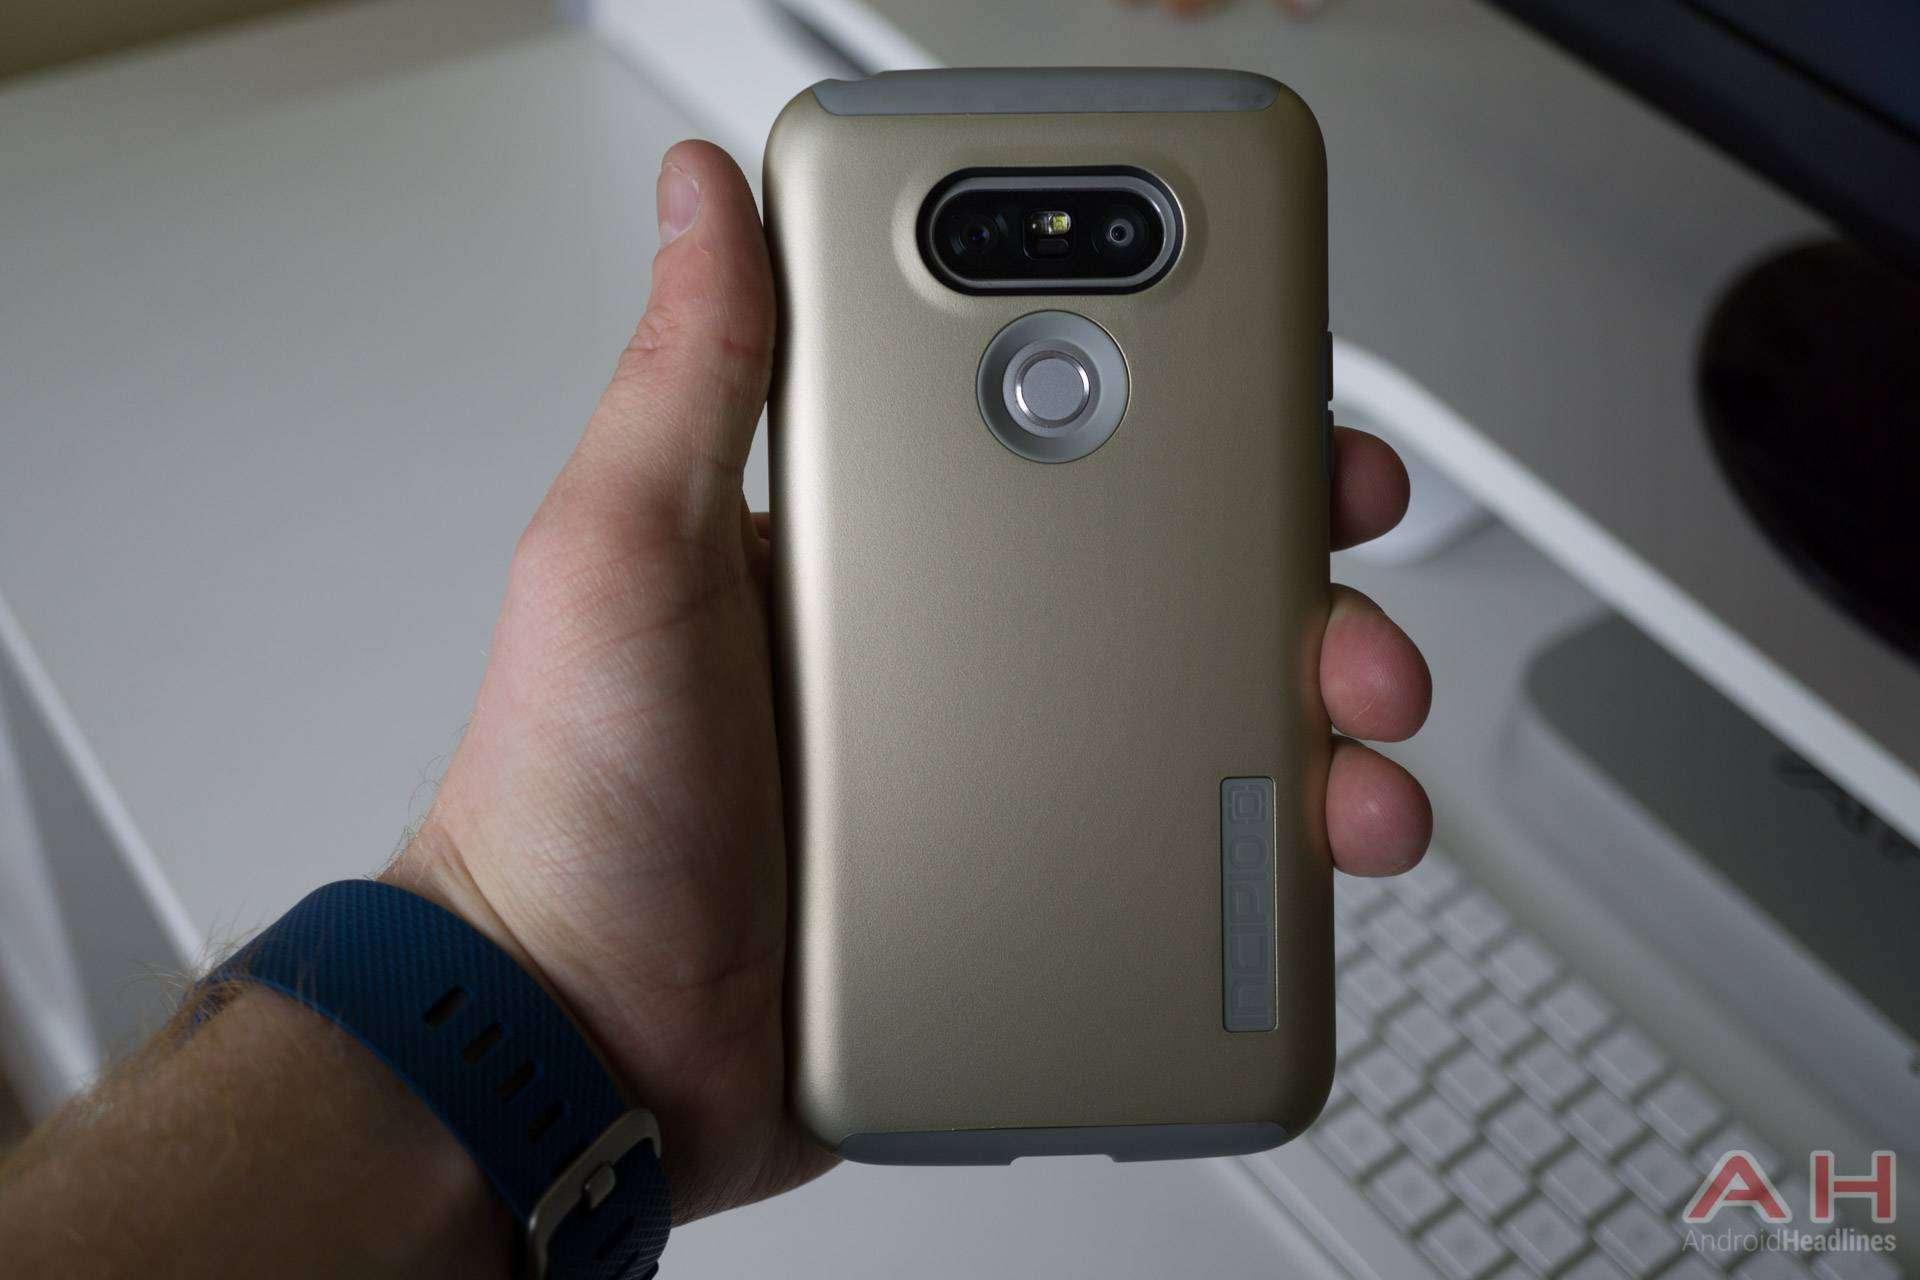 Incipio-DualPro-LG_G5 (8 of 9)